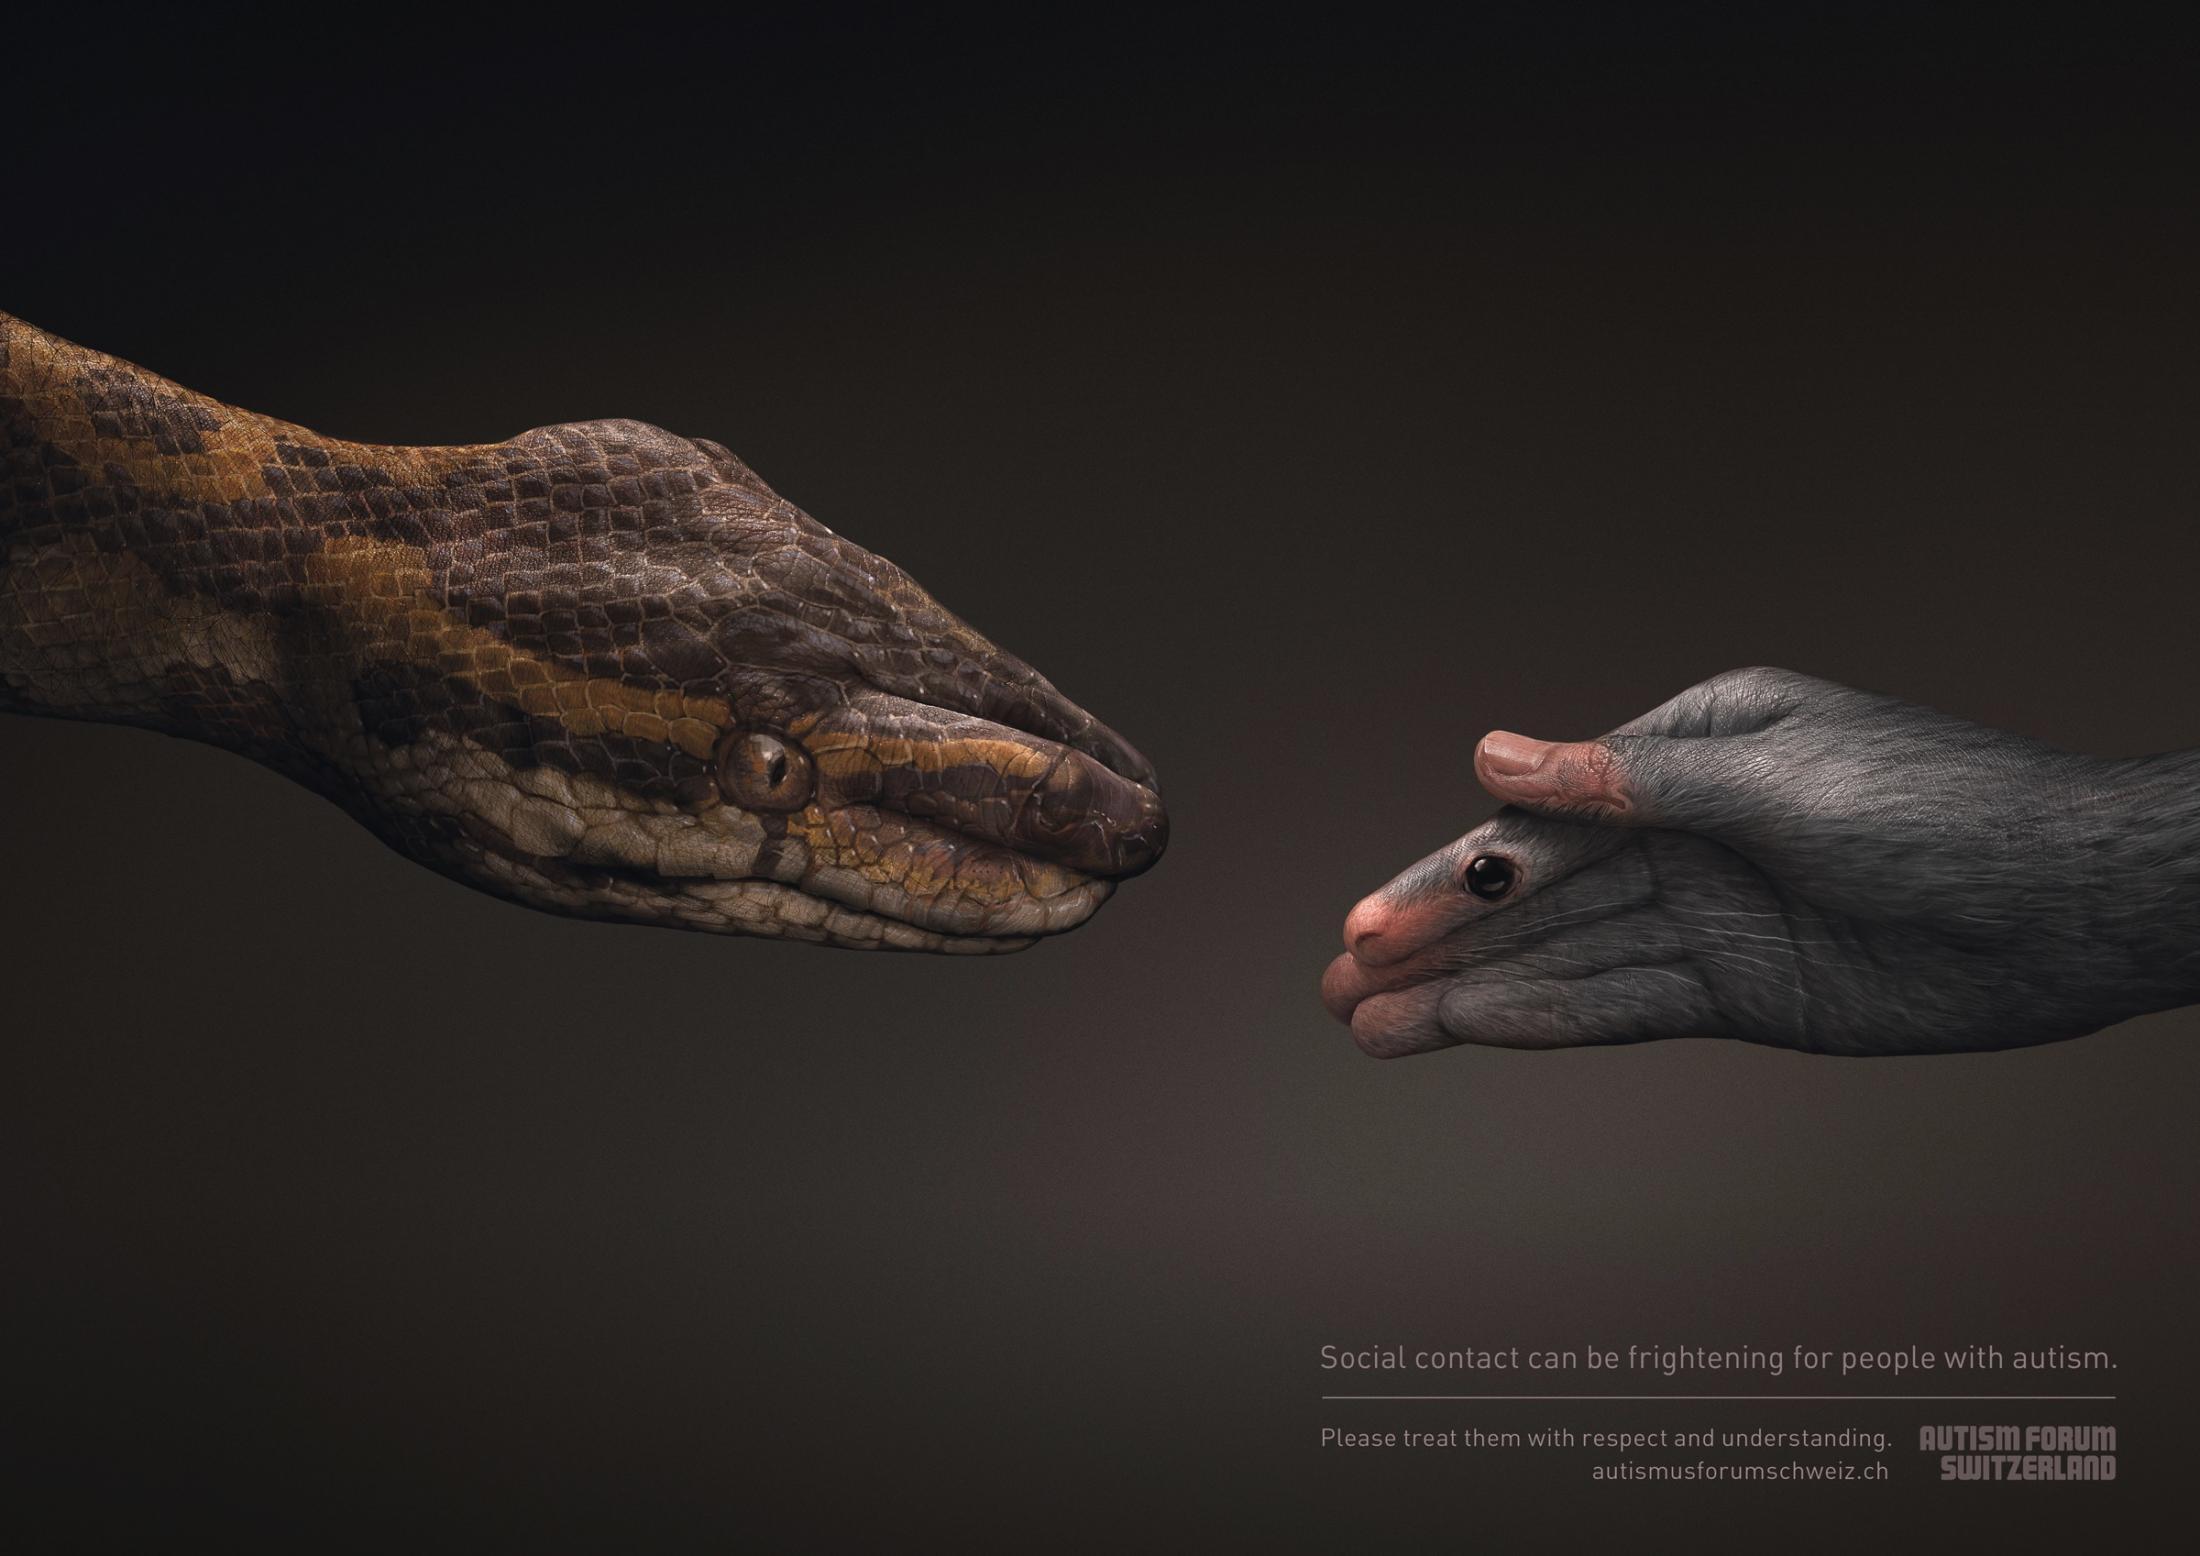 Autism Forum Switzerland Print Ad - Snake/Mouse